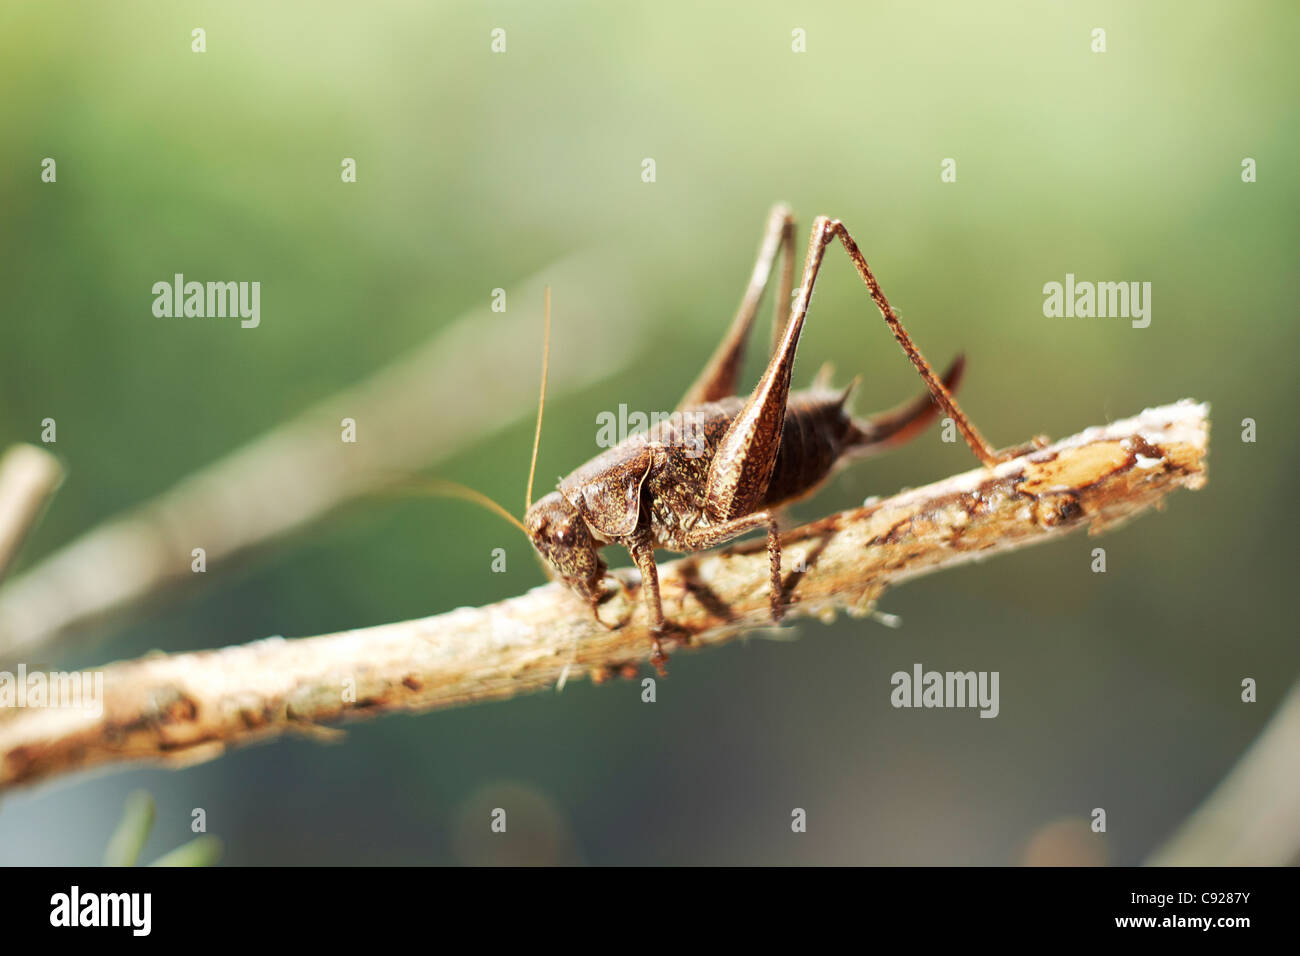 Bush cricket (Katydid) sitting on a twig - Stock Image